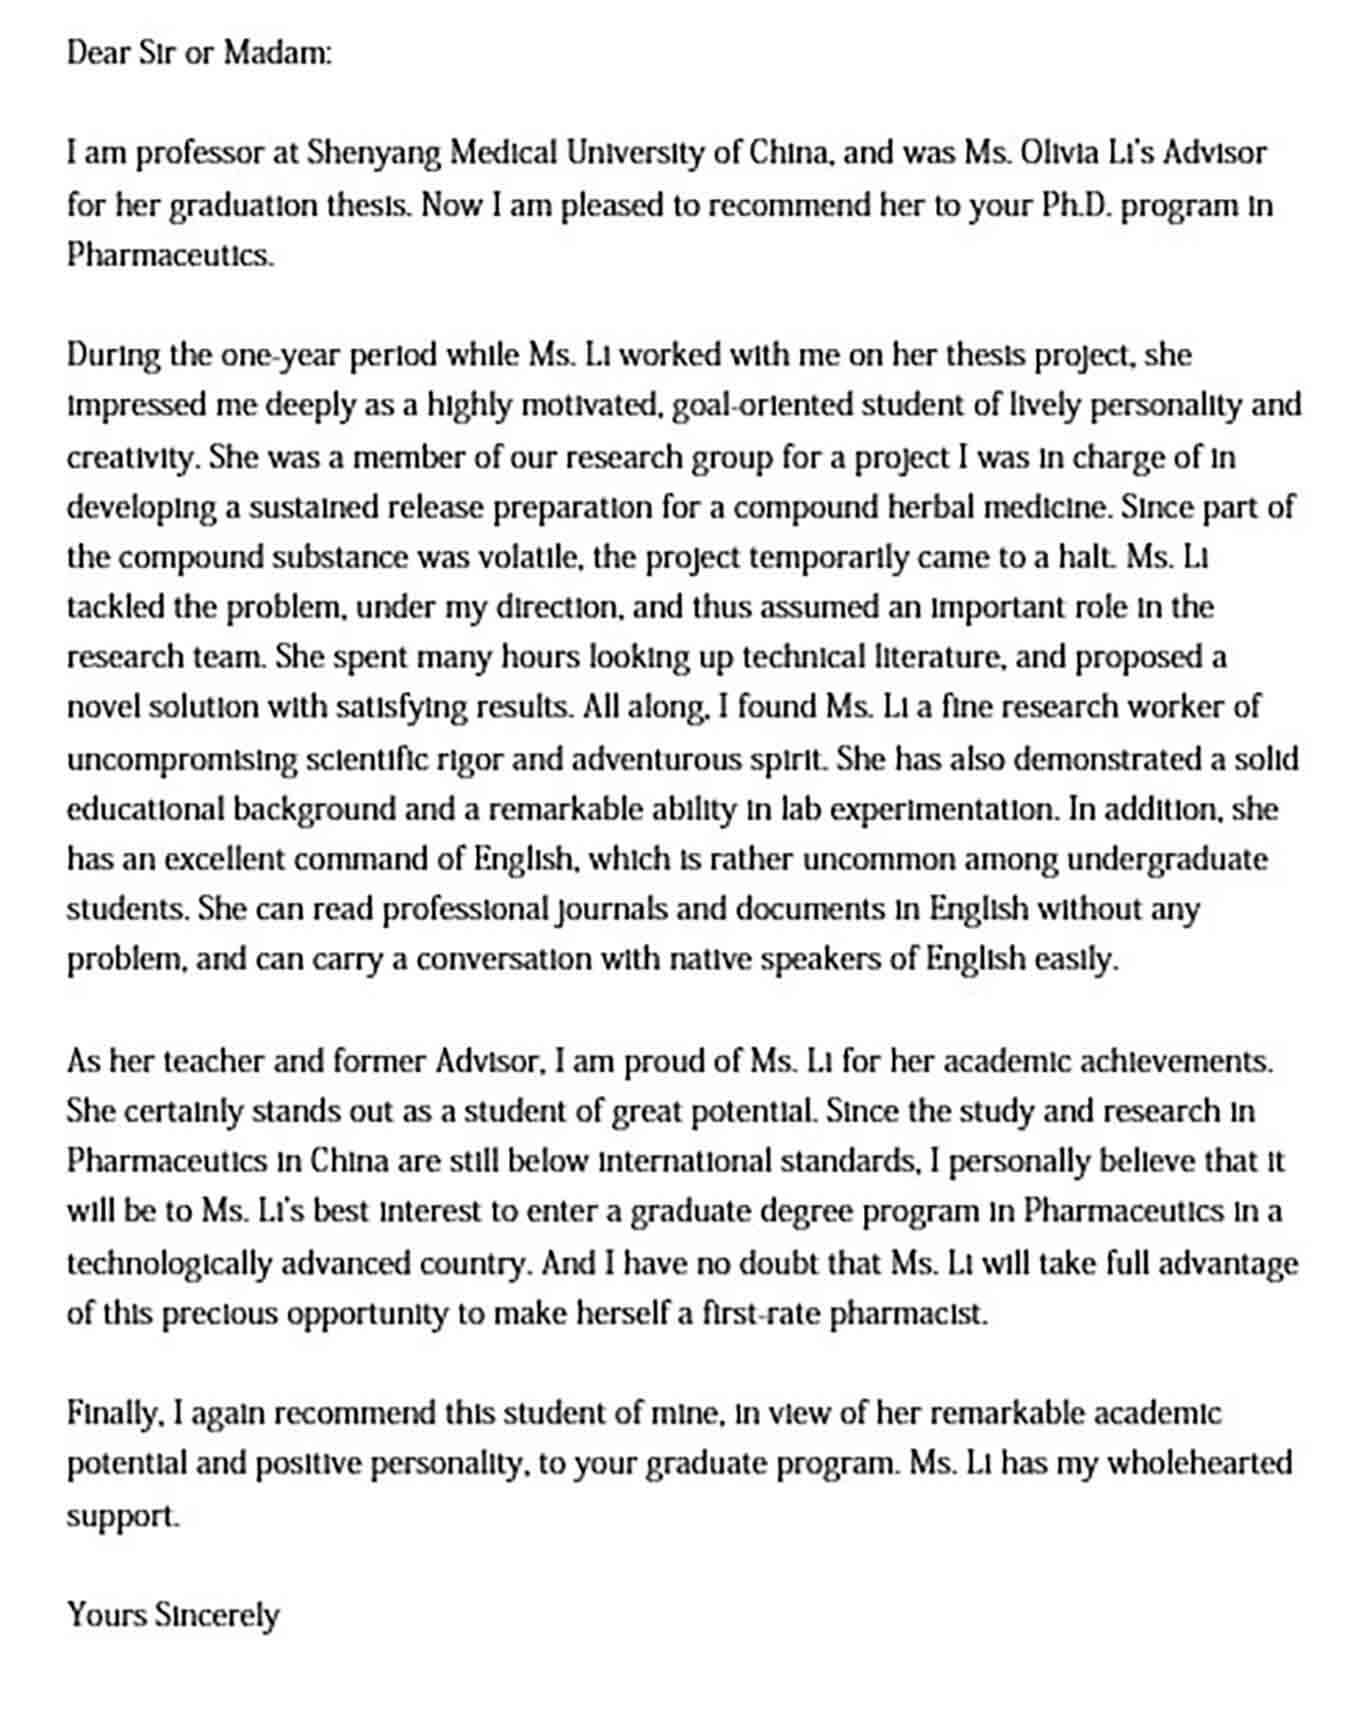 University Medical School Recommendation Letter